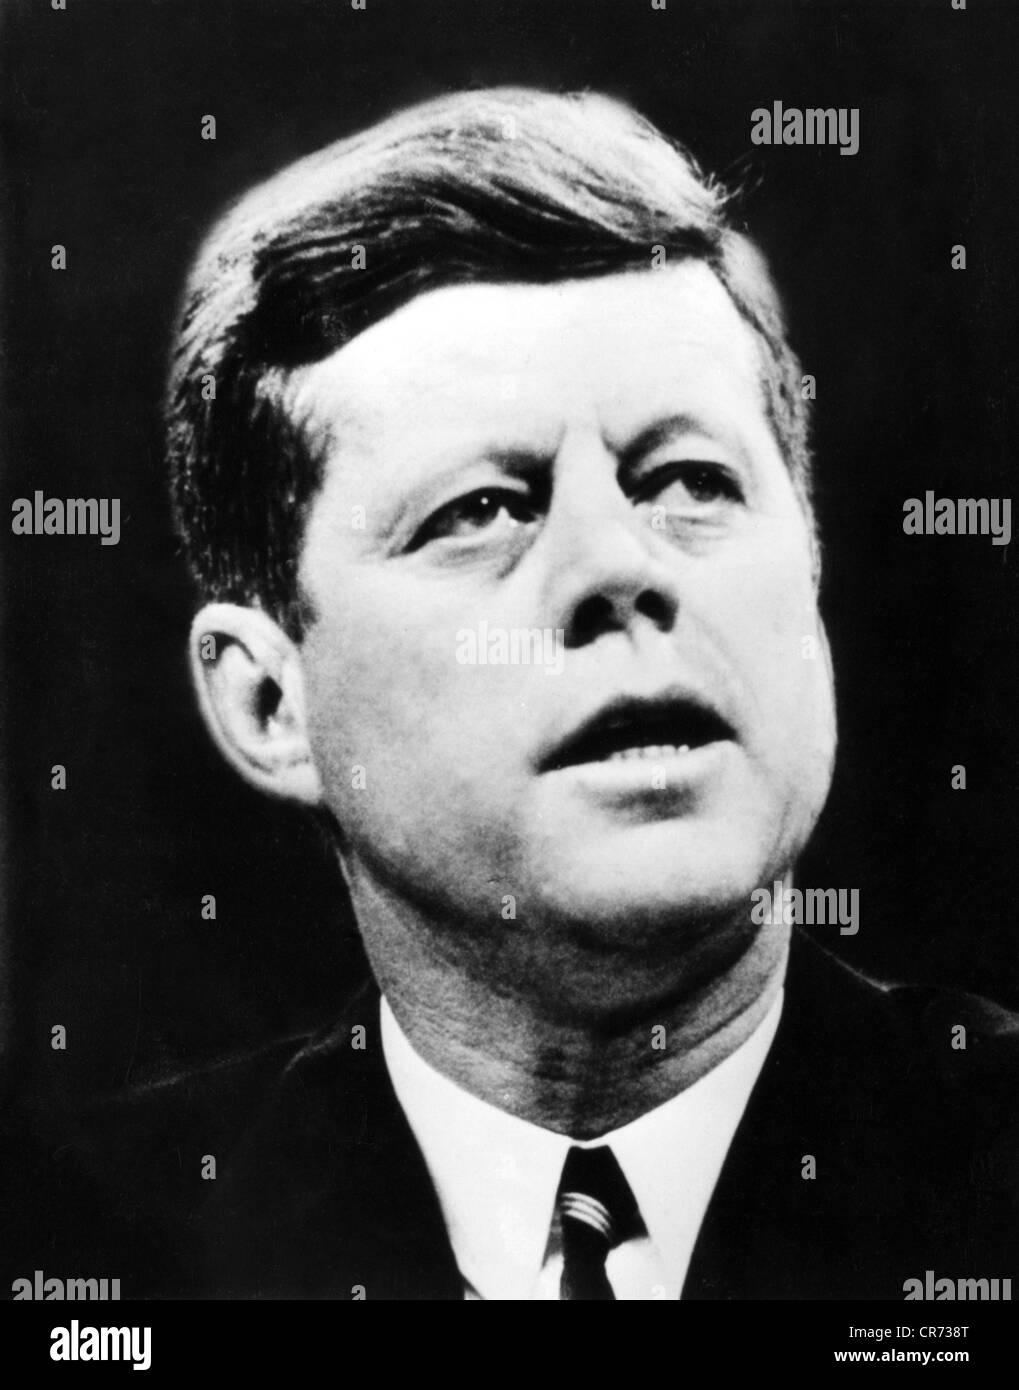 Kennedy, John Fitzgerald, 29.5.1917 - 22.11.1963, US-amerikanischer Politiker (Dem.), Präsident der USA 20.1.1961 Stockbild